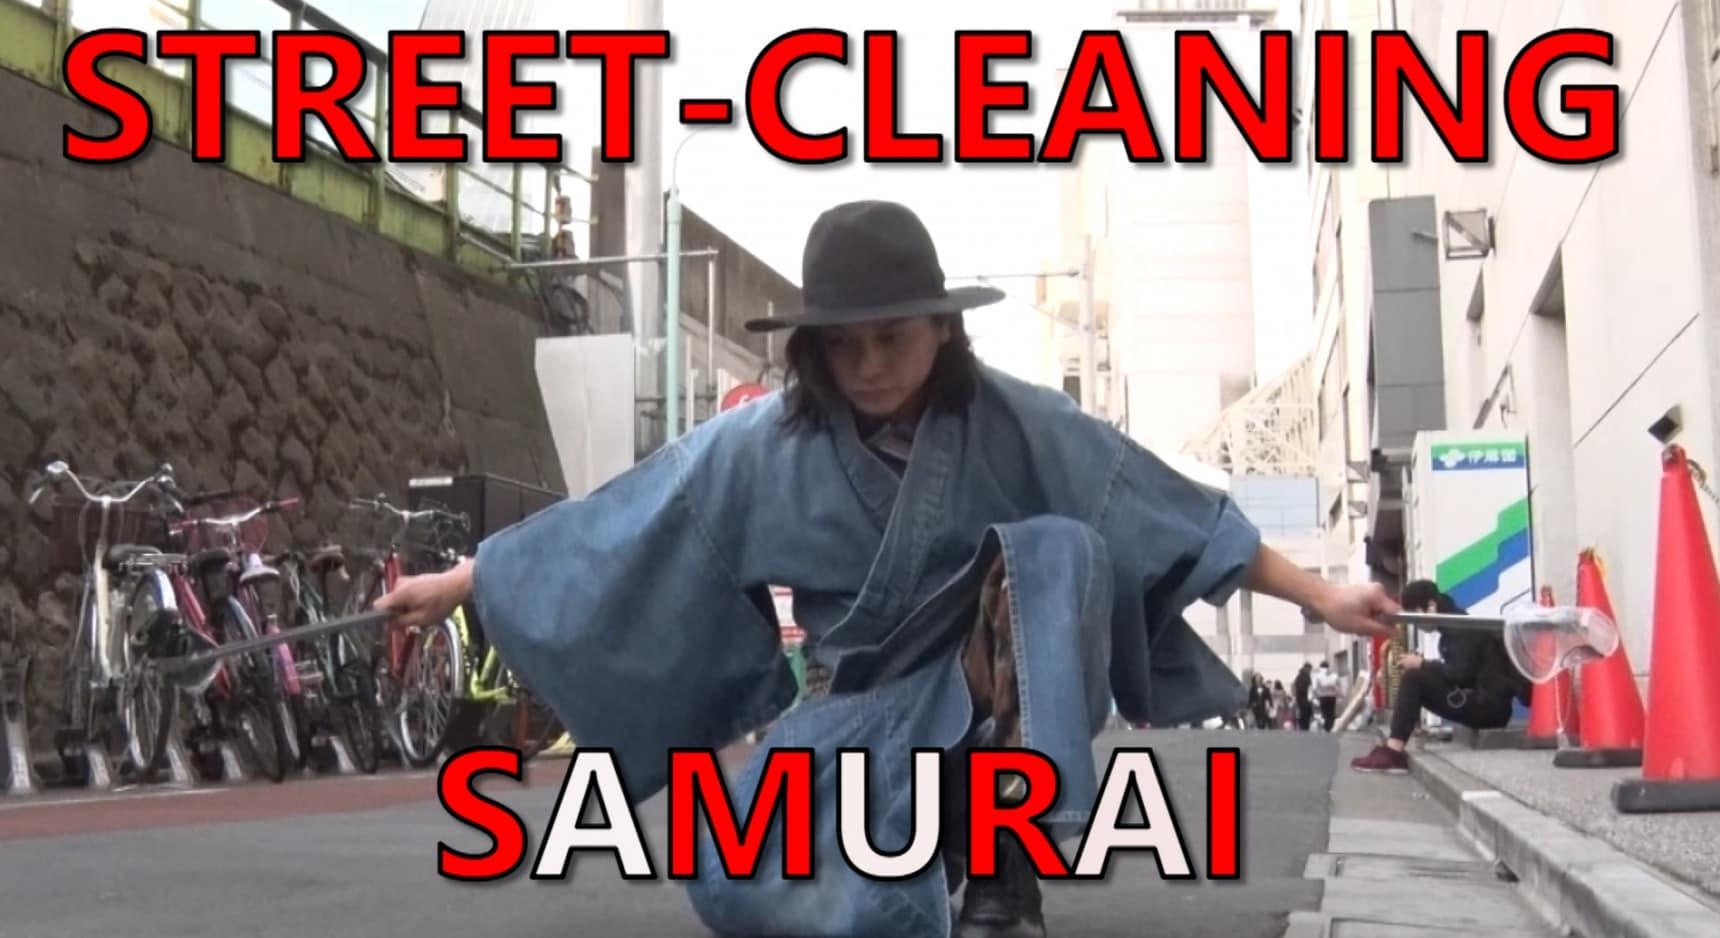 Samurai Clean the Mean Streets of Tokyo